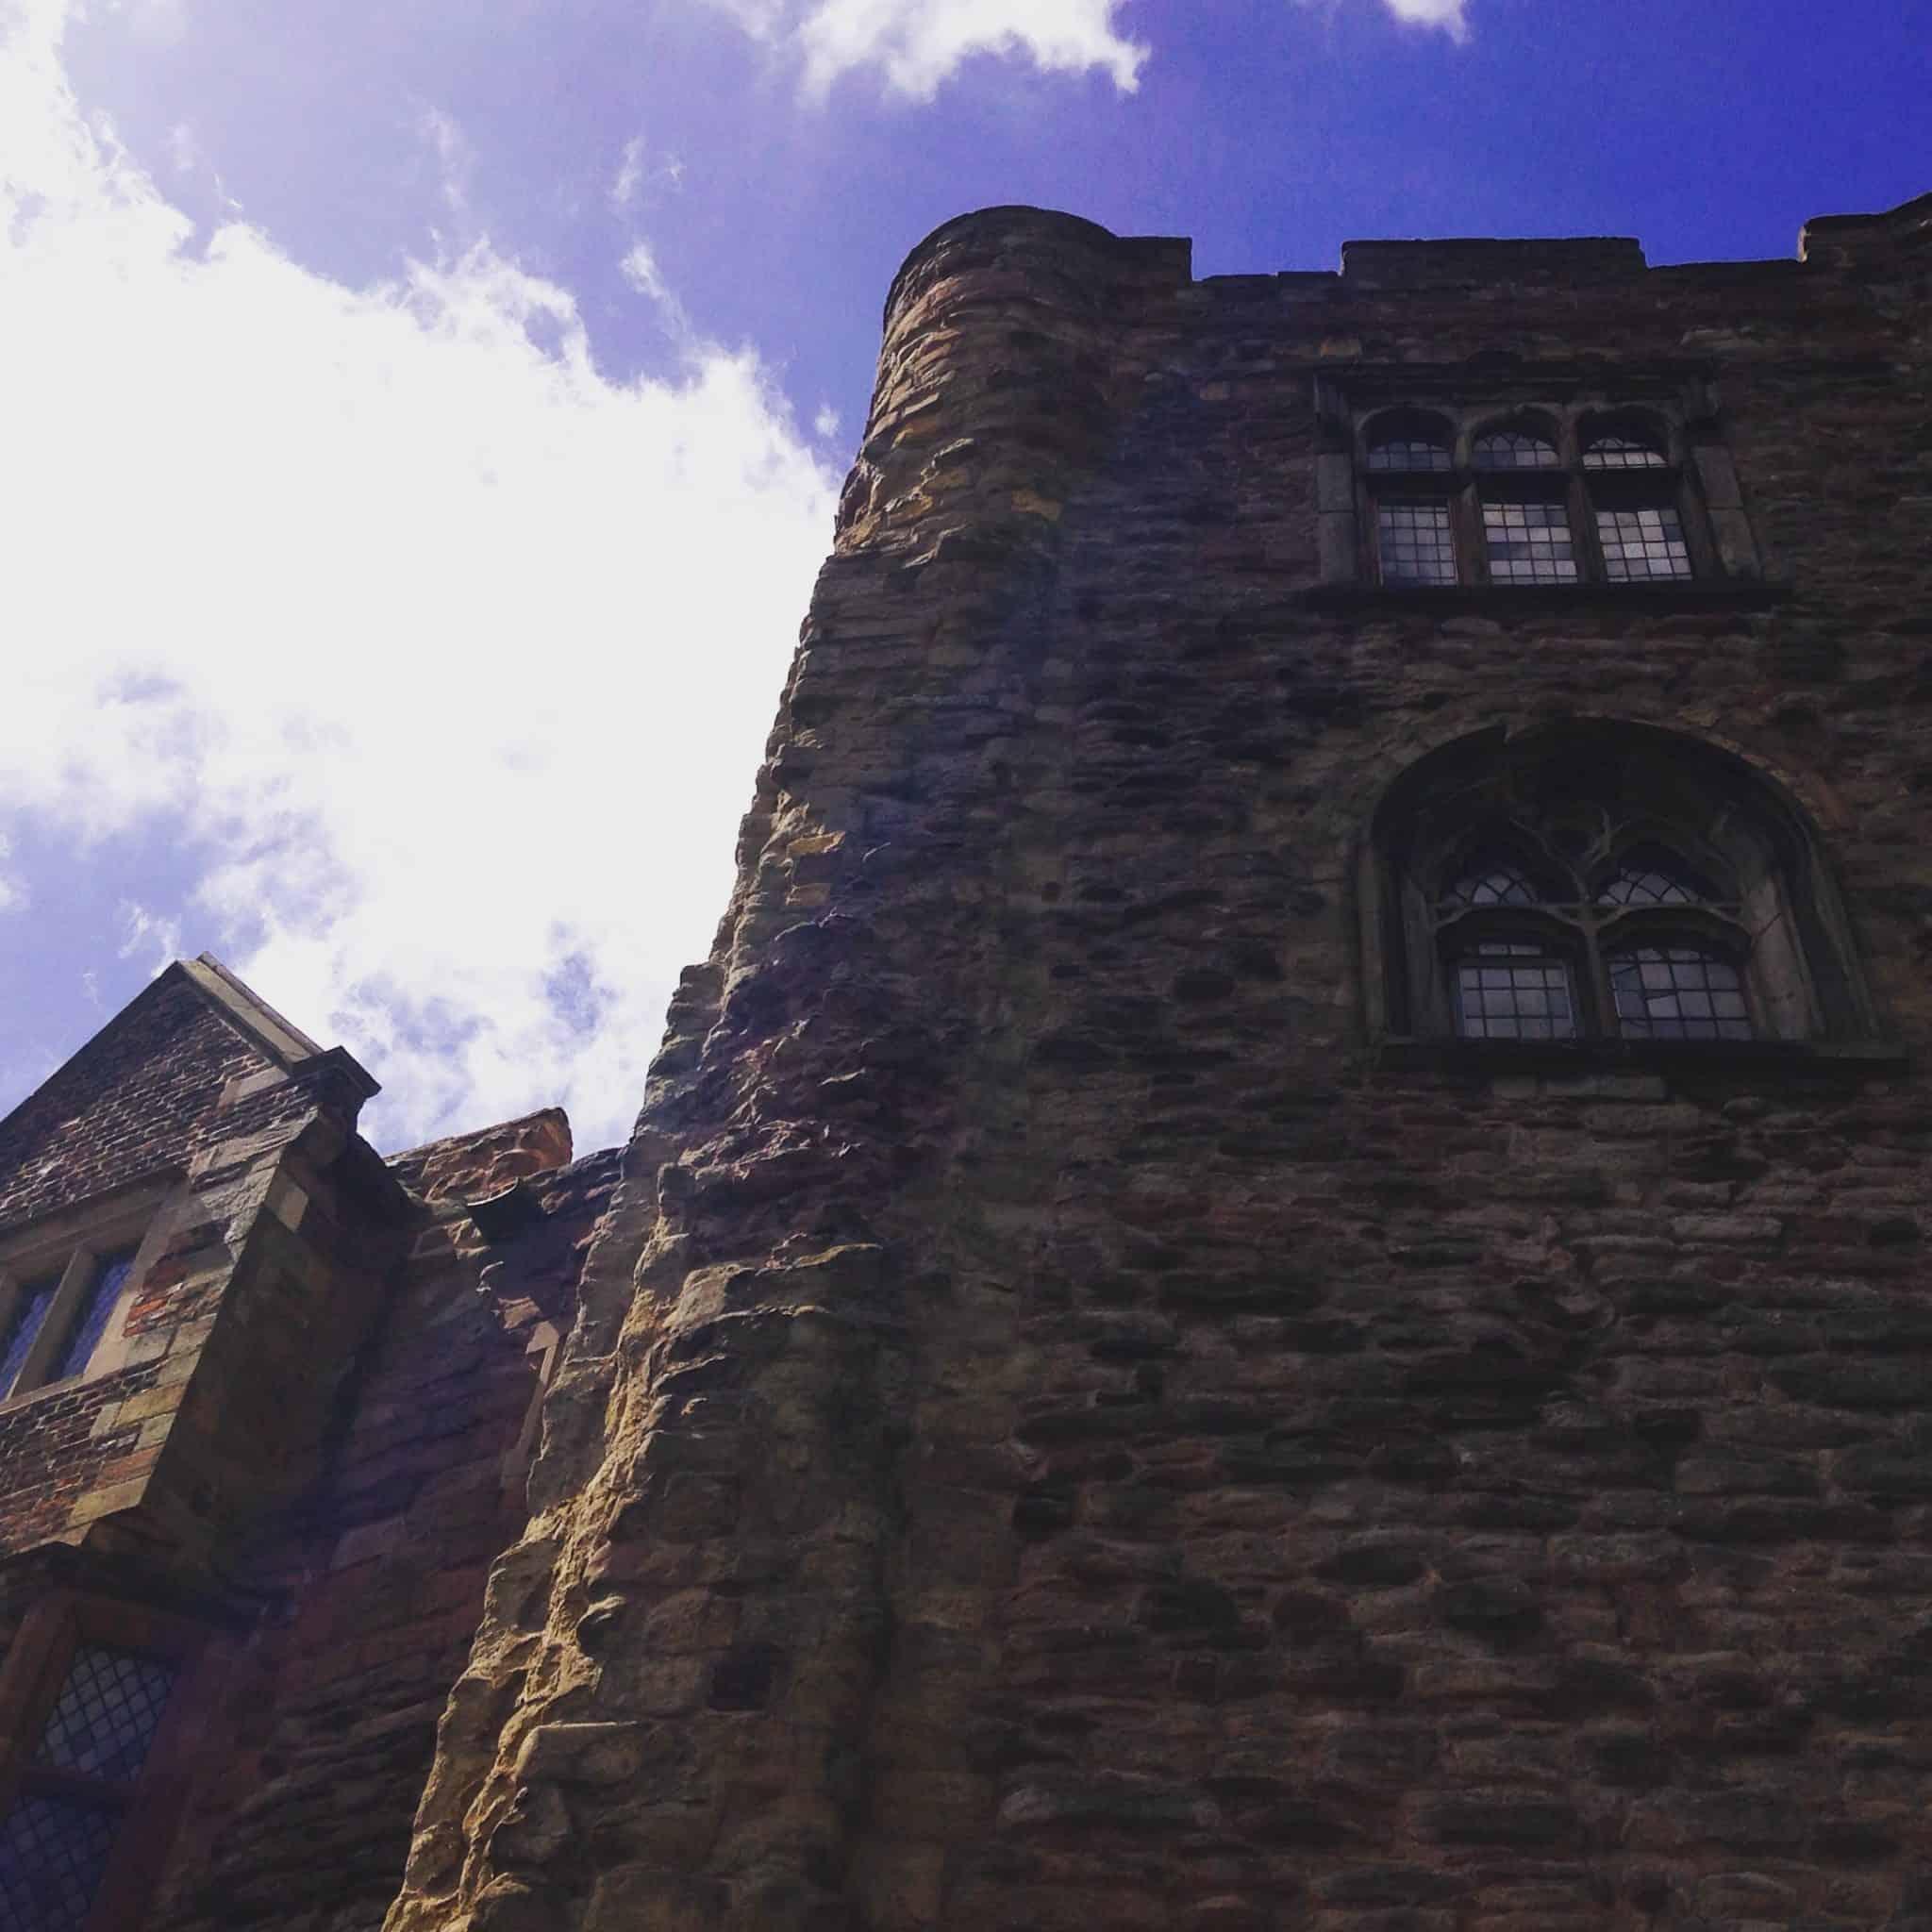 Exploring Tamworth Castle in Staffordshire